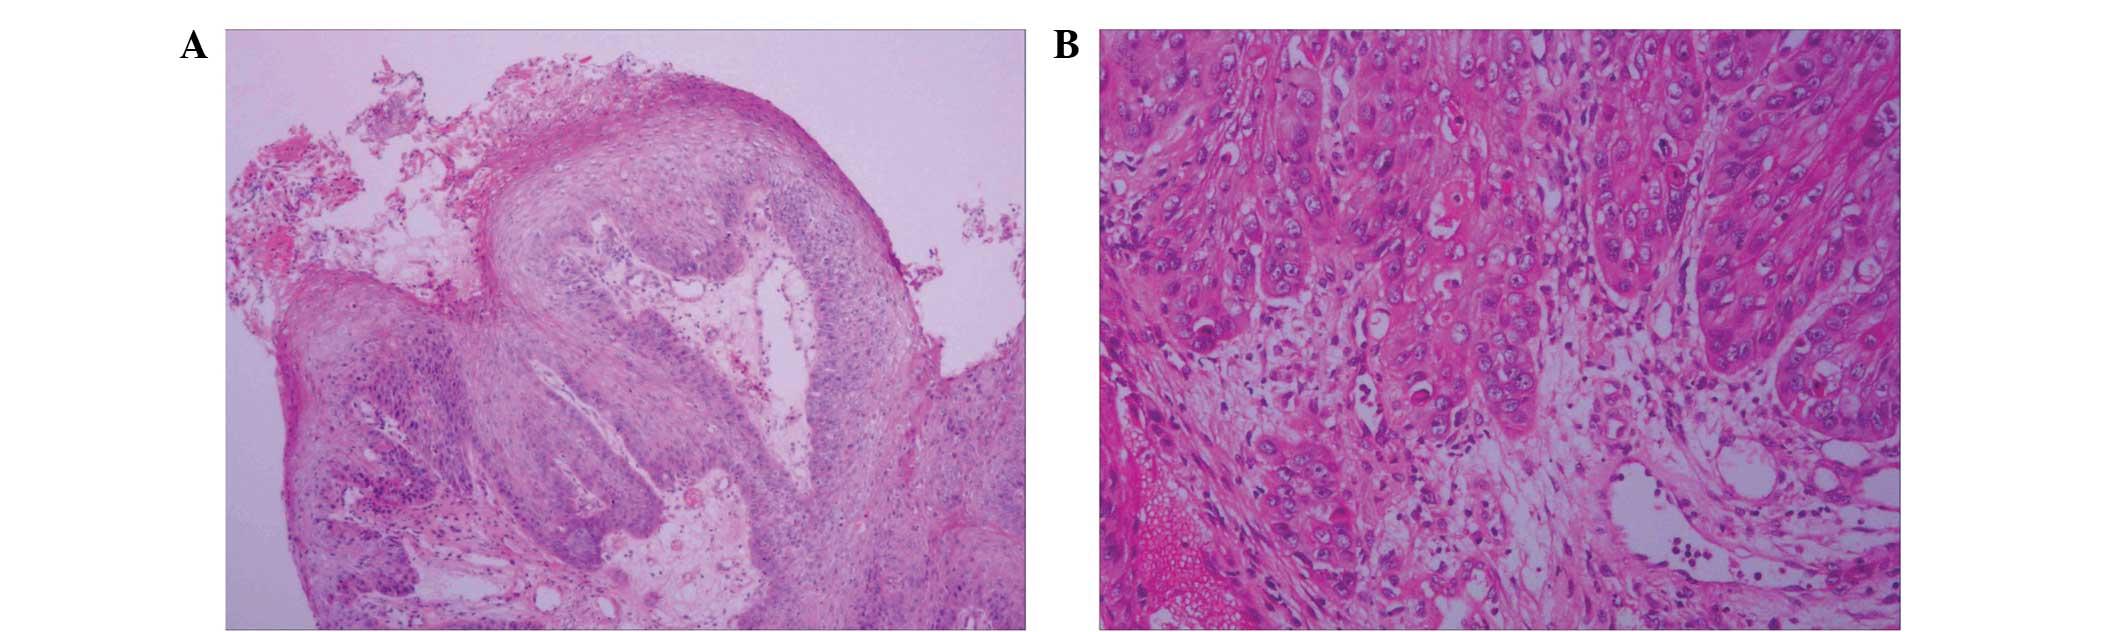 laryngeal squamous papilloma cancerul de vezica urinara tratament